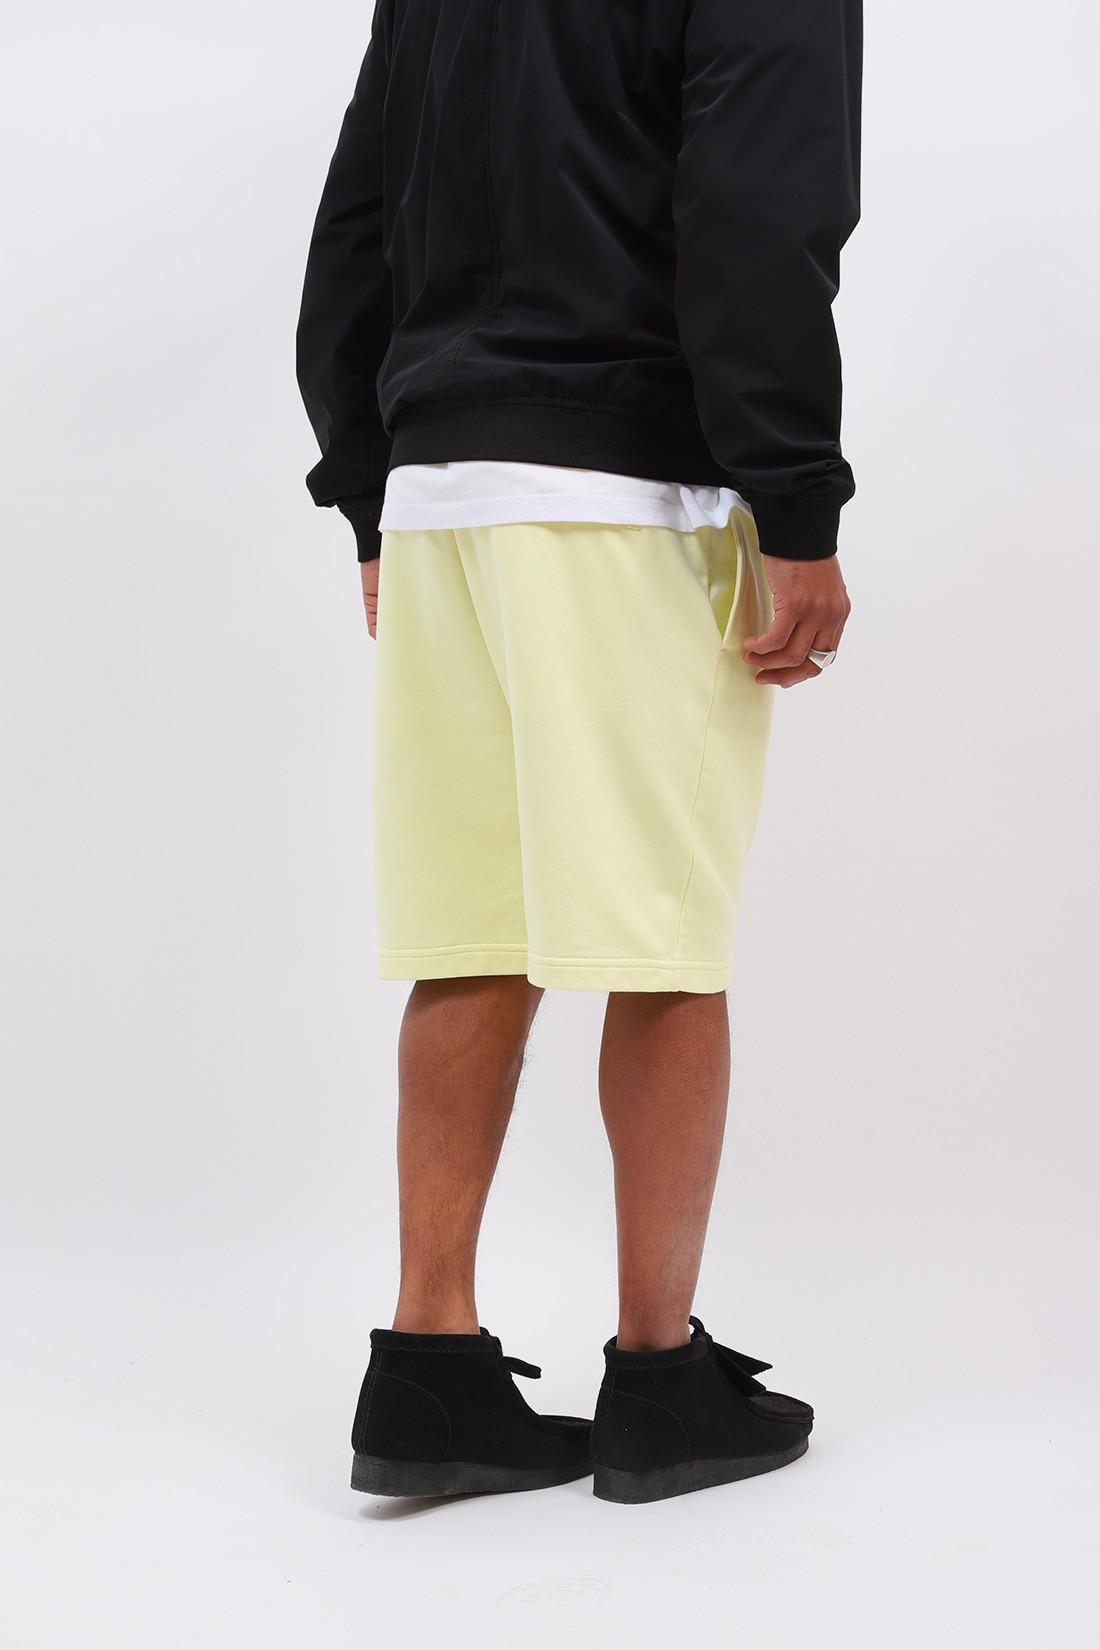 STONE ISLAND / 64651 fleece short v0031 Limone